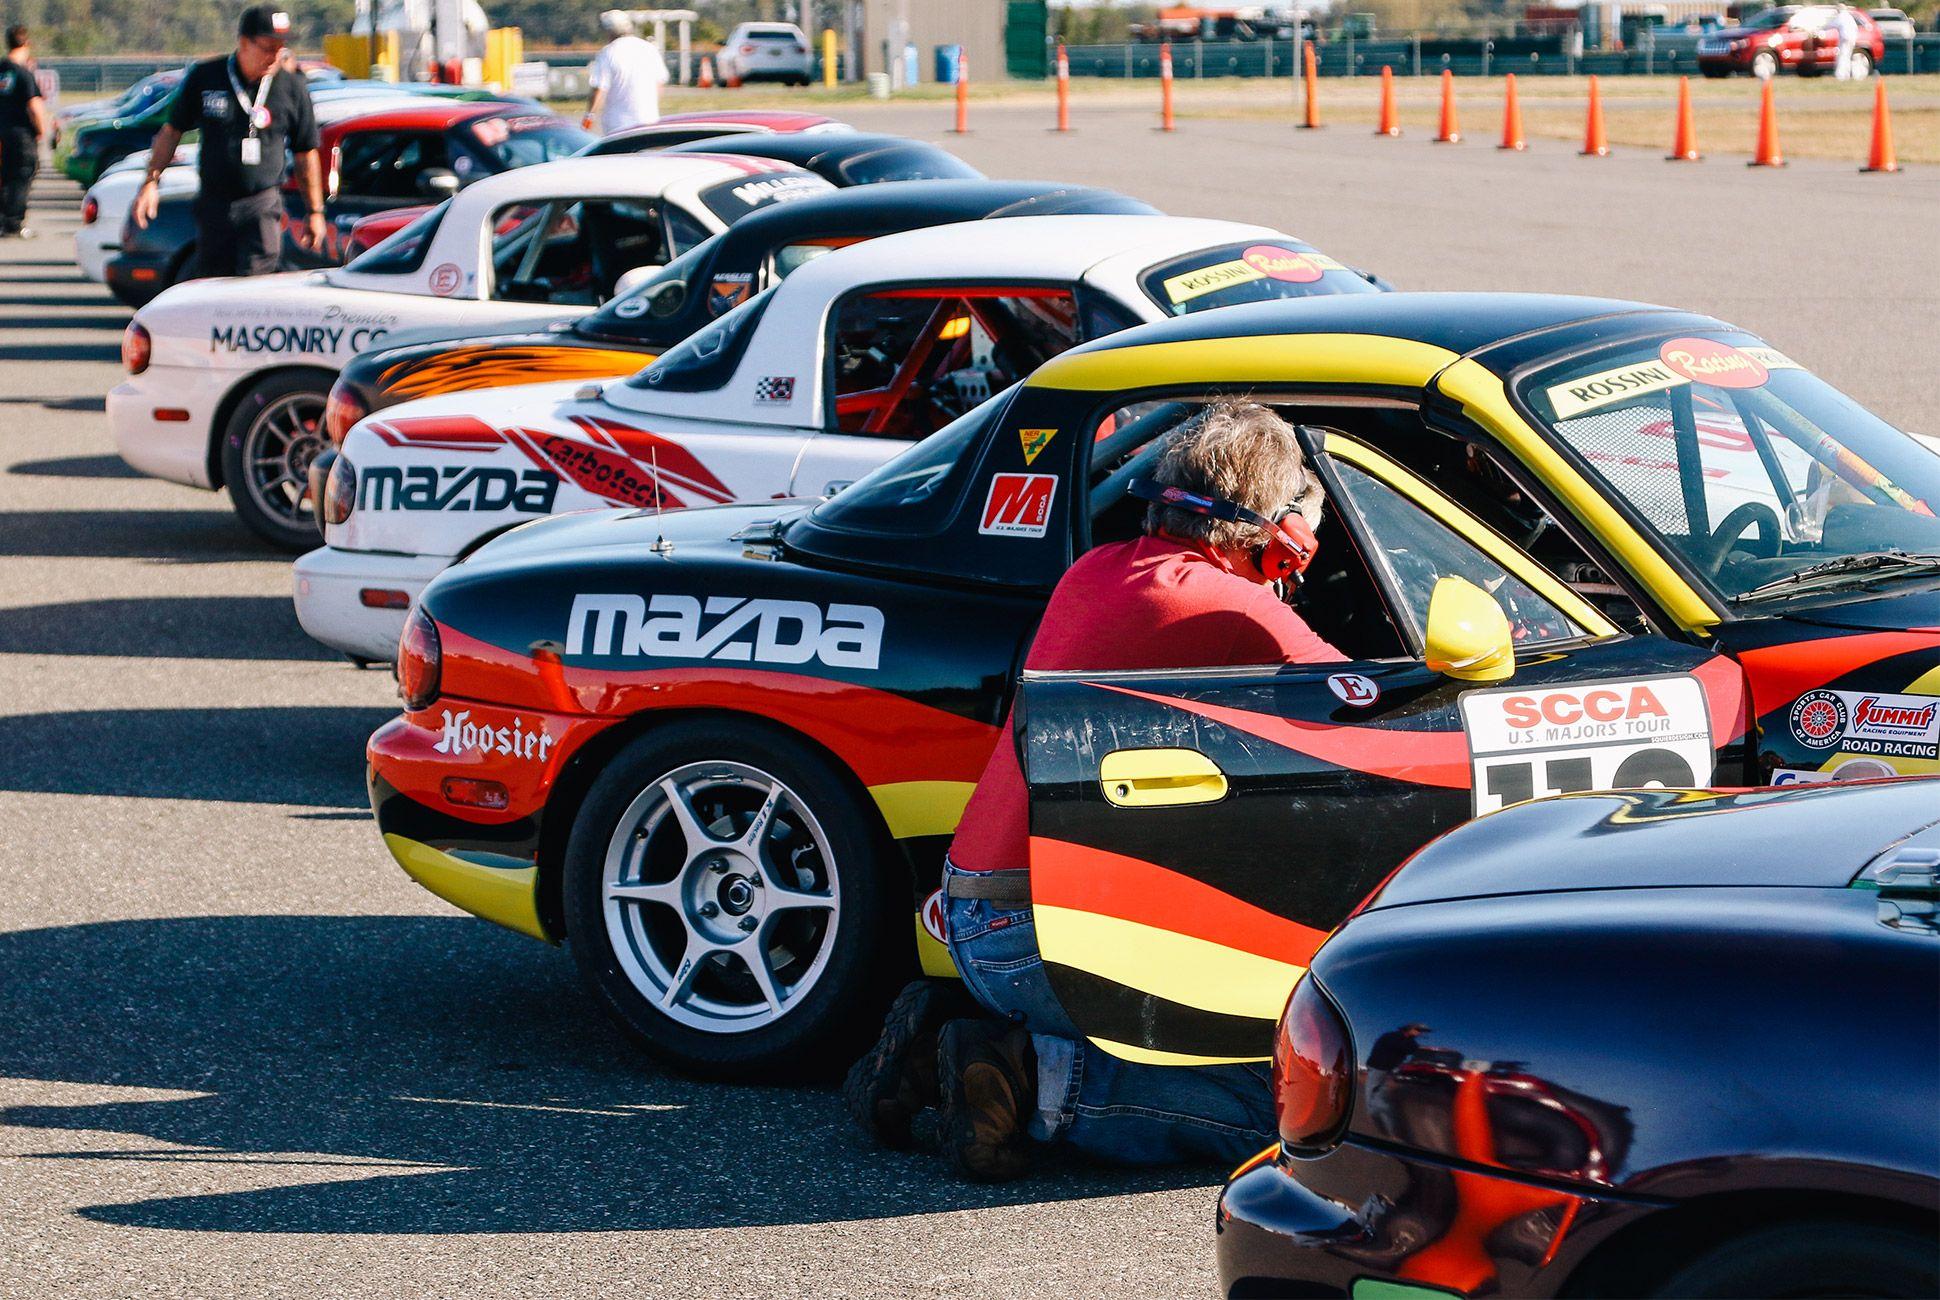 Mazda-Miata-The-Best-Vintage-Sportscar-gear-patrol-1